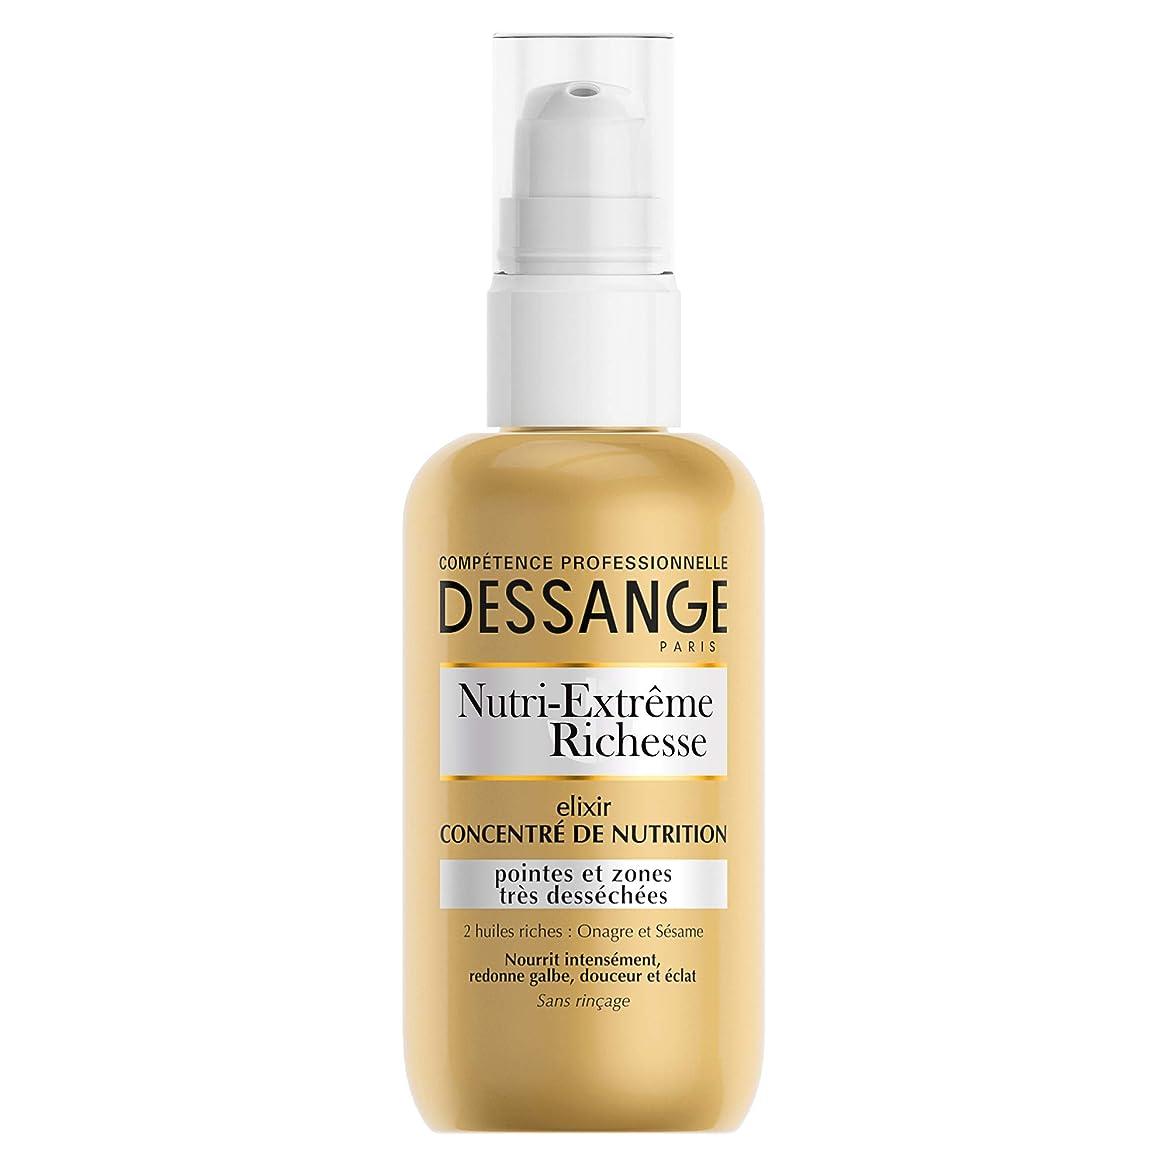 Dessange Nutri - Extreme Richness Elixir濃縮栄養ケア非常に乾燥した先端と領域のためのすすぎなし100 ml